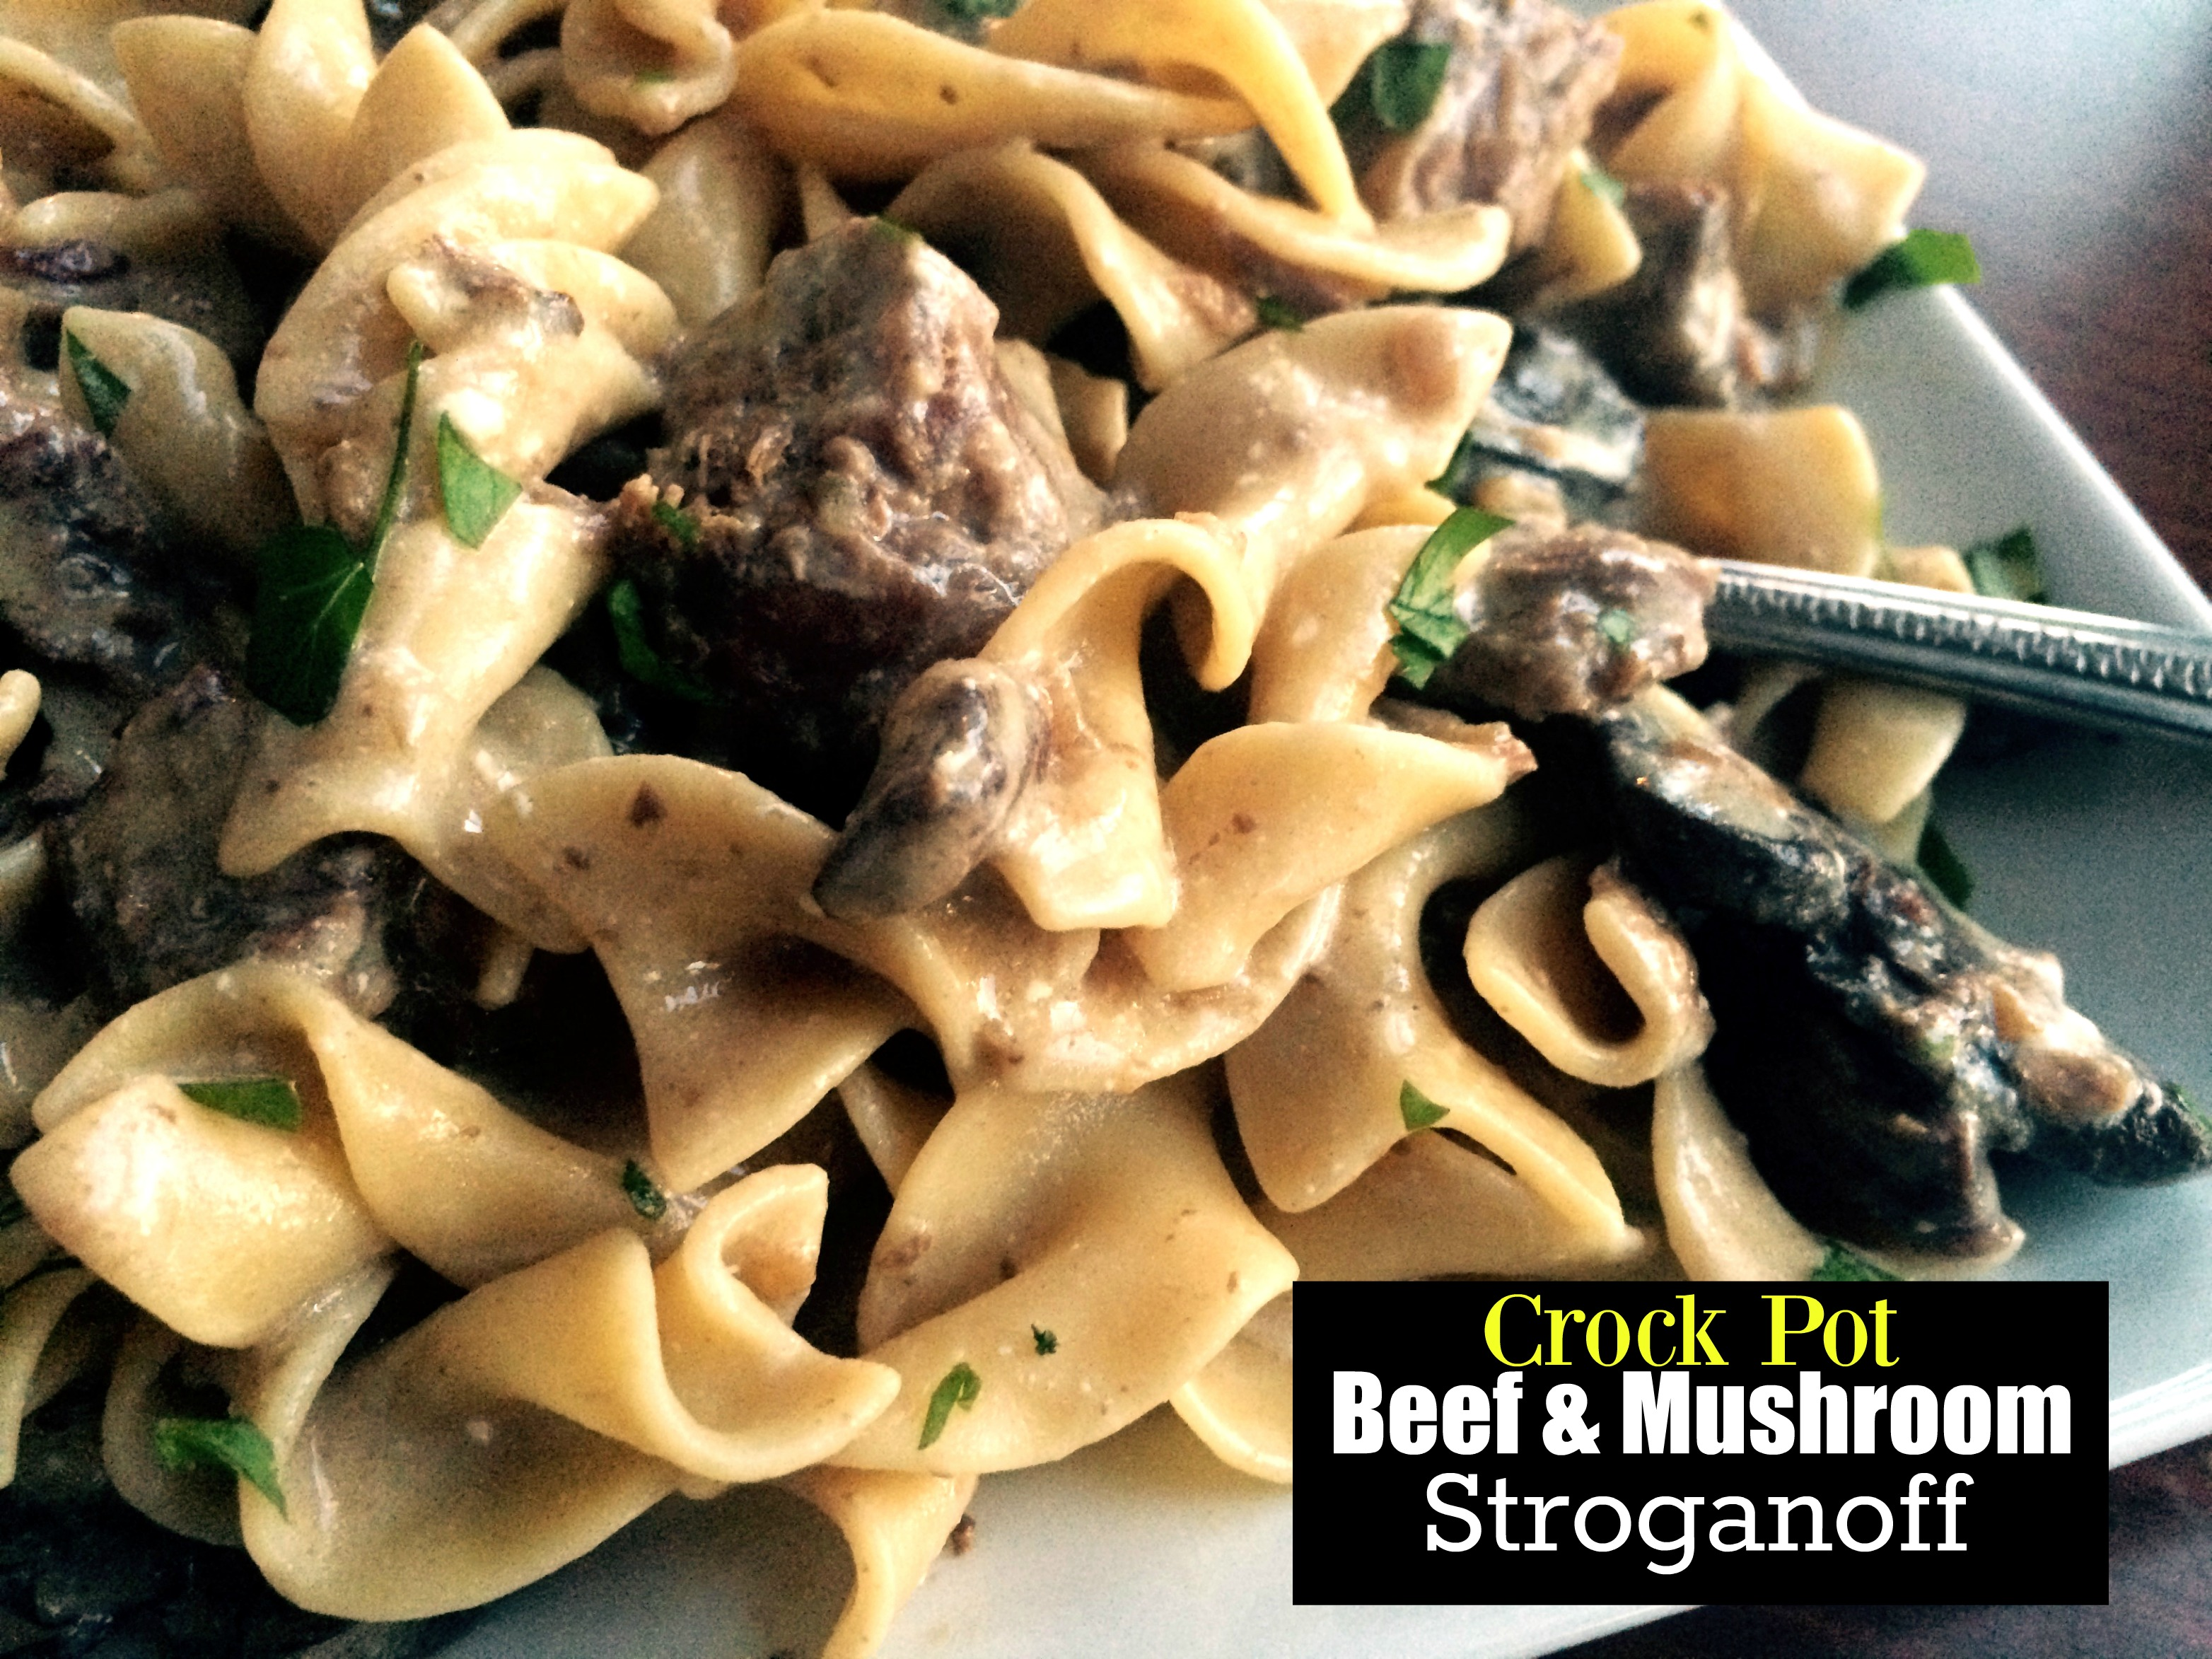 Crock Pot Beef & Mushroom Stroganoff